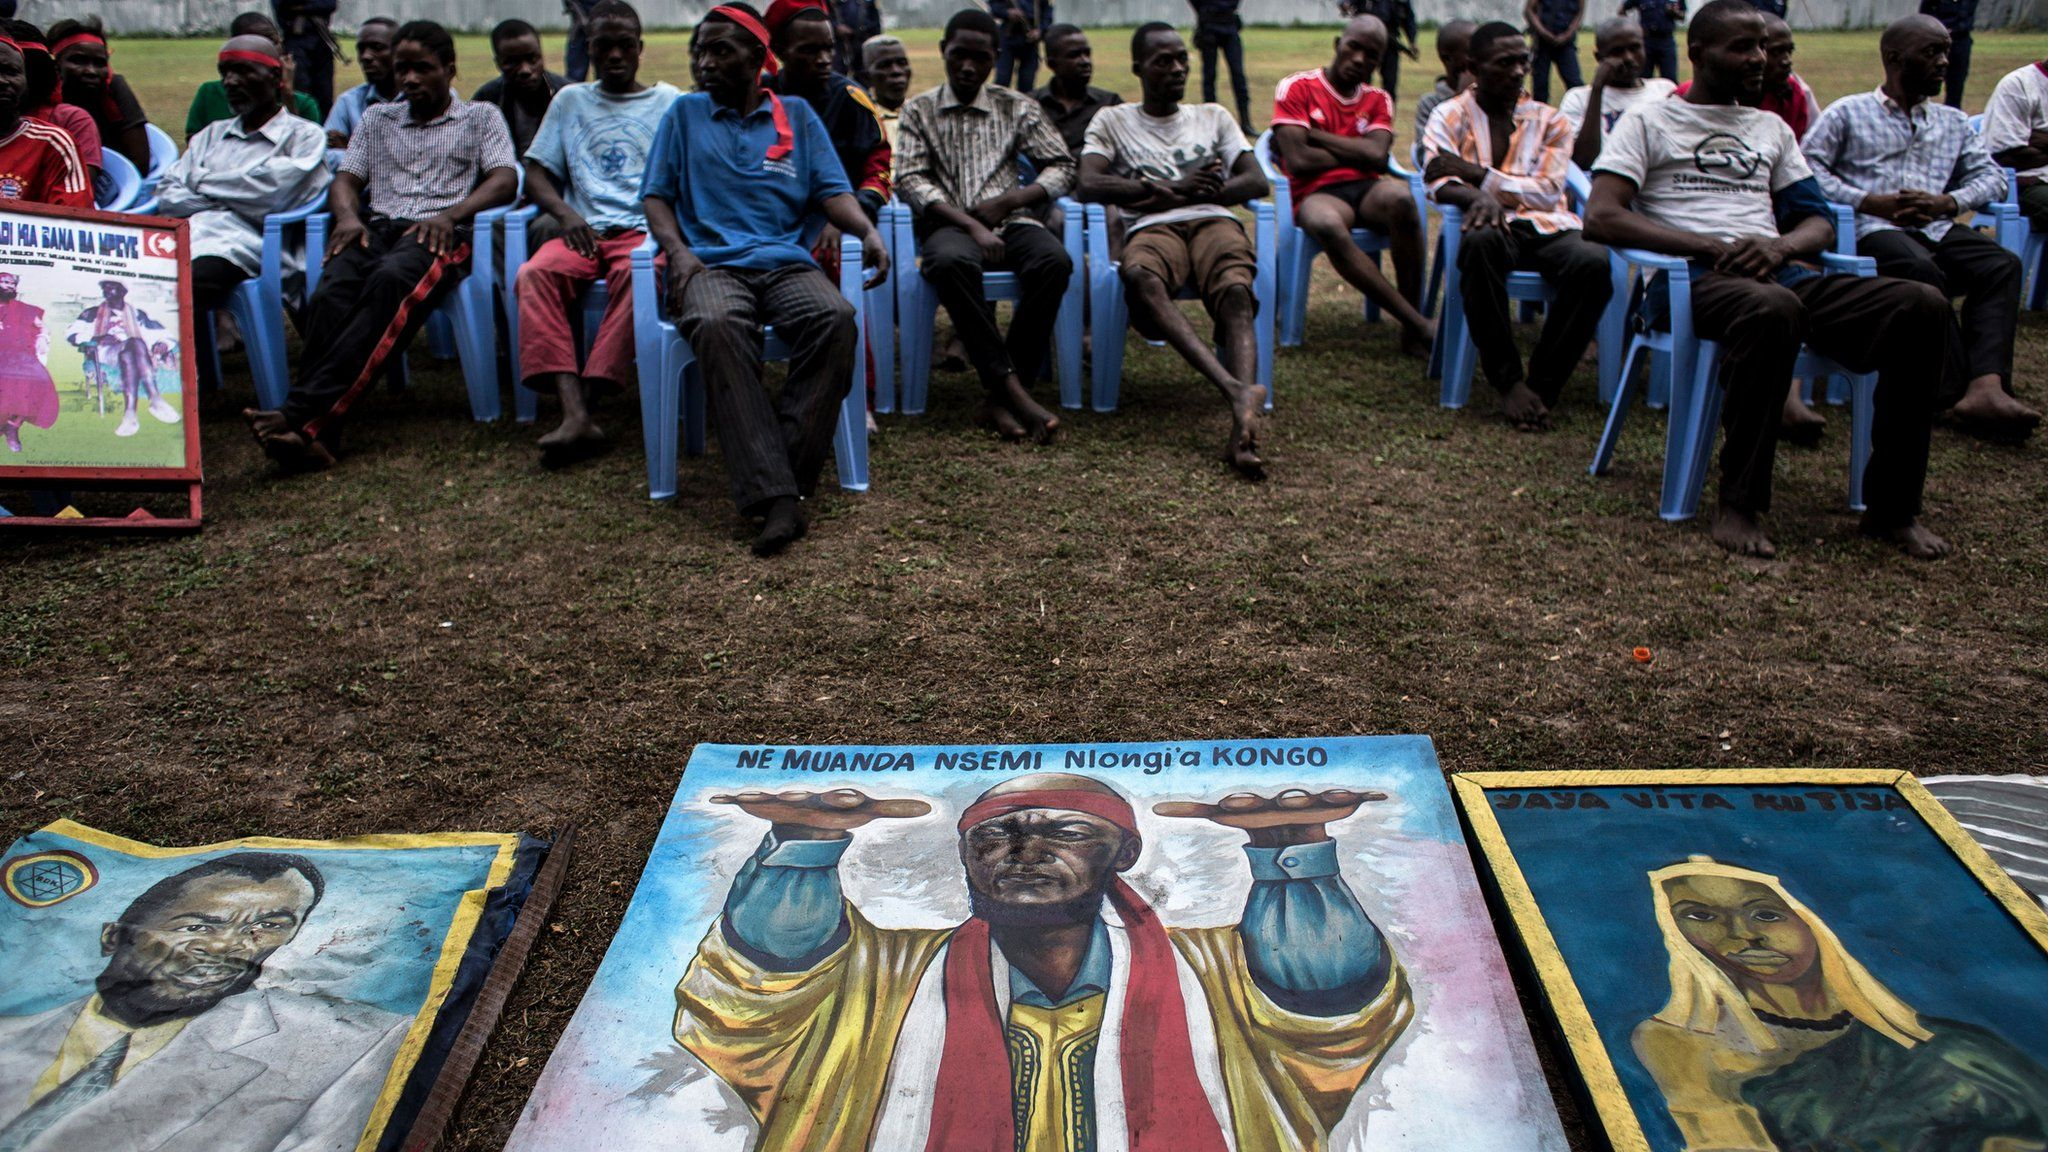 Men sit behind paintings of Bundu Dia Mayala group leader Muanda Nsemiare.